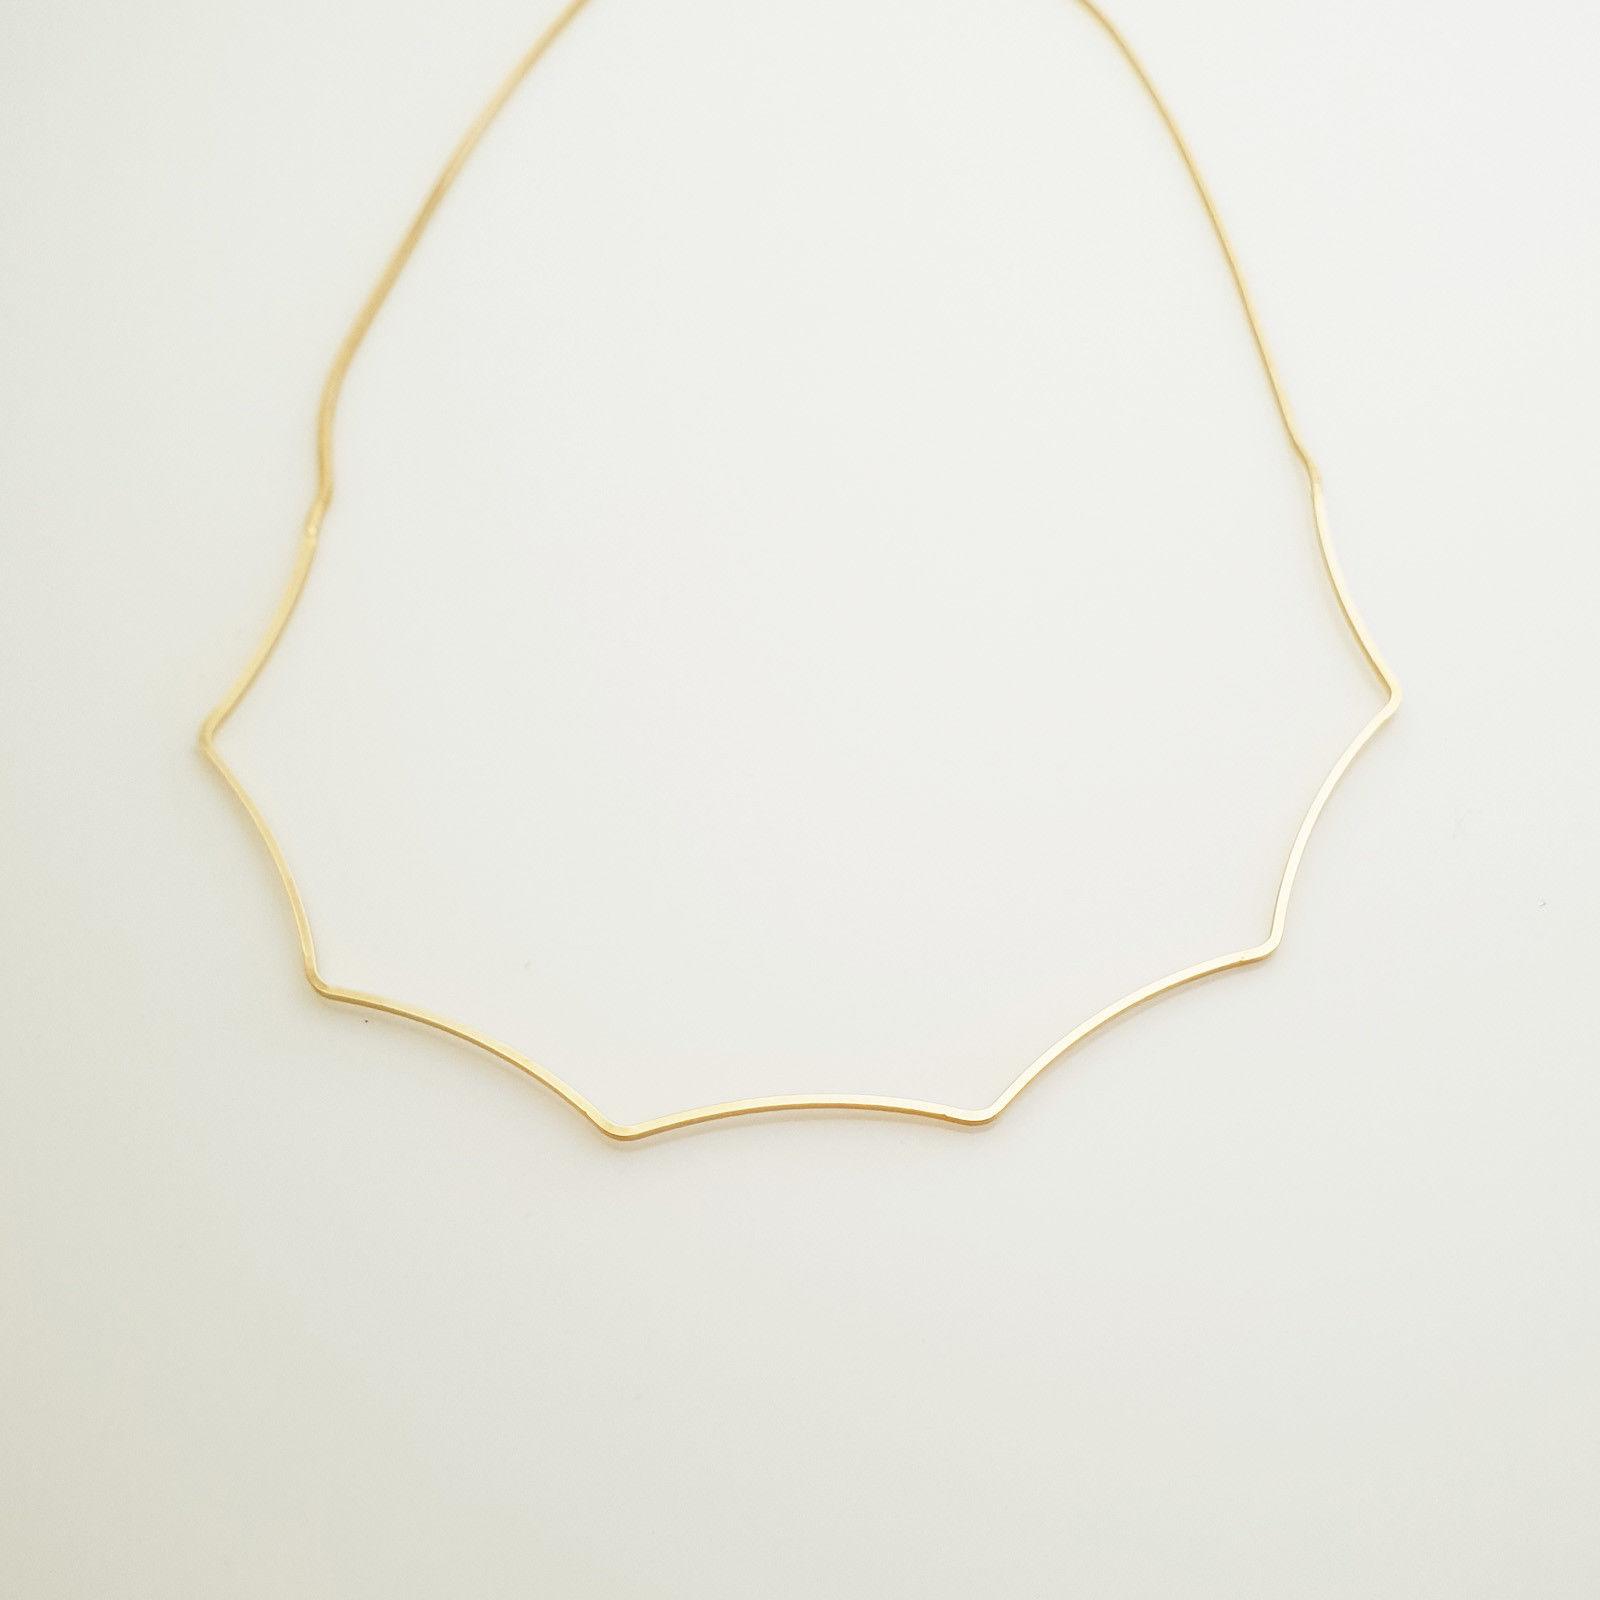 Wave Bar Choker Necklace Brass Gold Tone Fashion Item N19